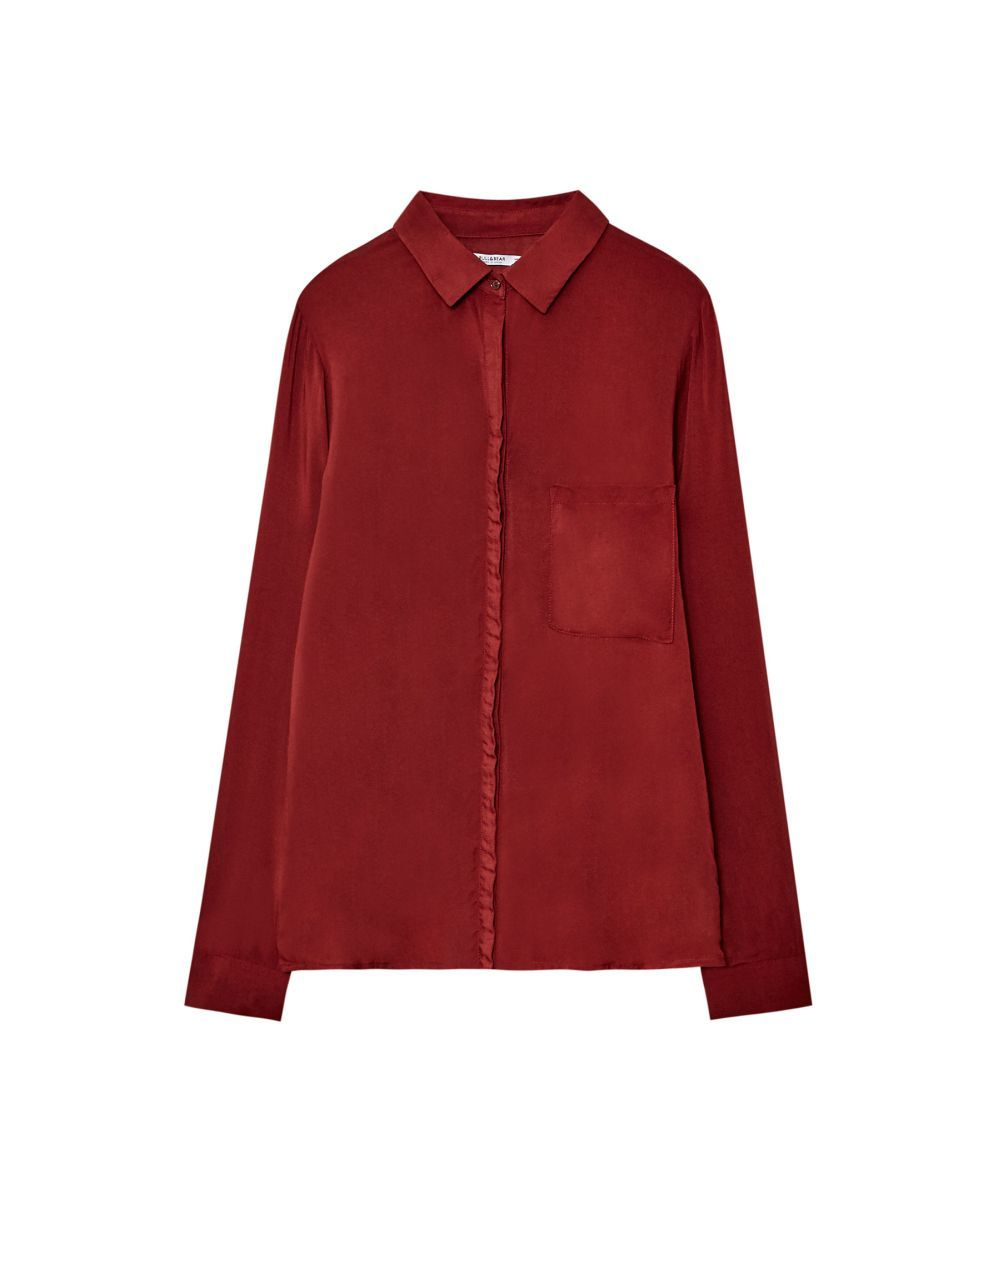 Camisa granate de Pull&Bear (12,99 euros)